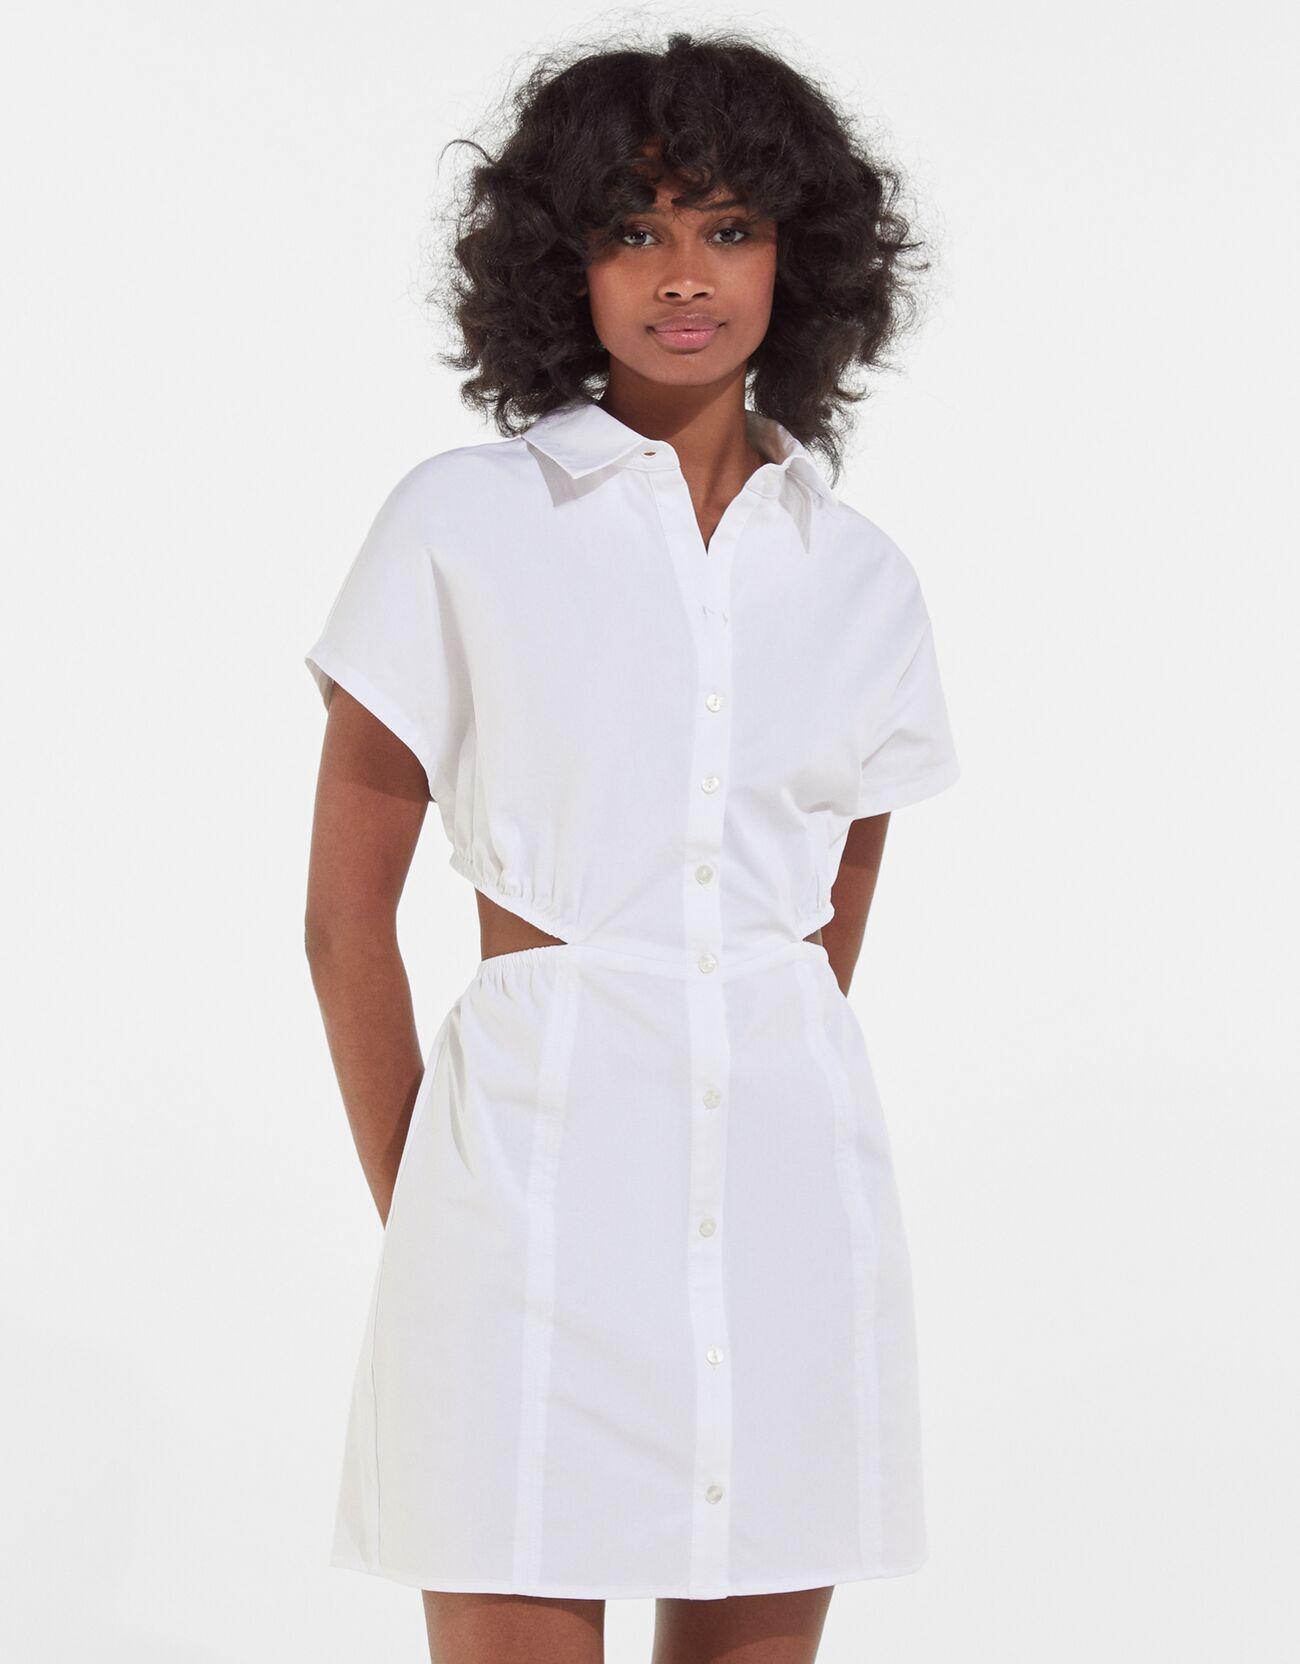 bershka -  Rückenfreies Popelin-Hemdkleid Damen L Rohweiß